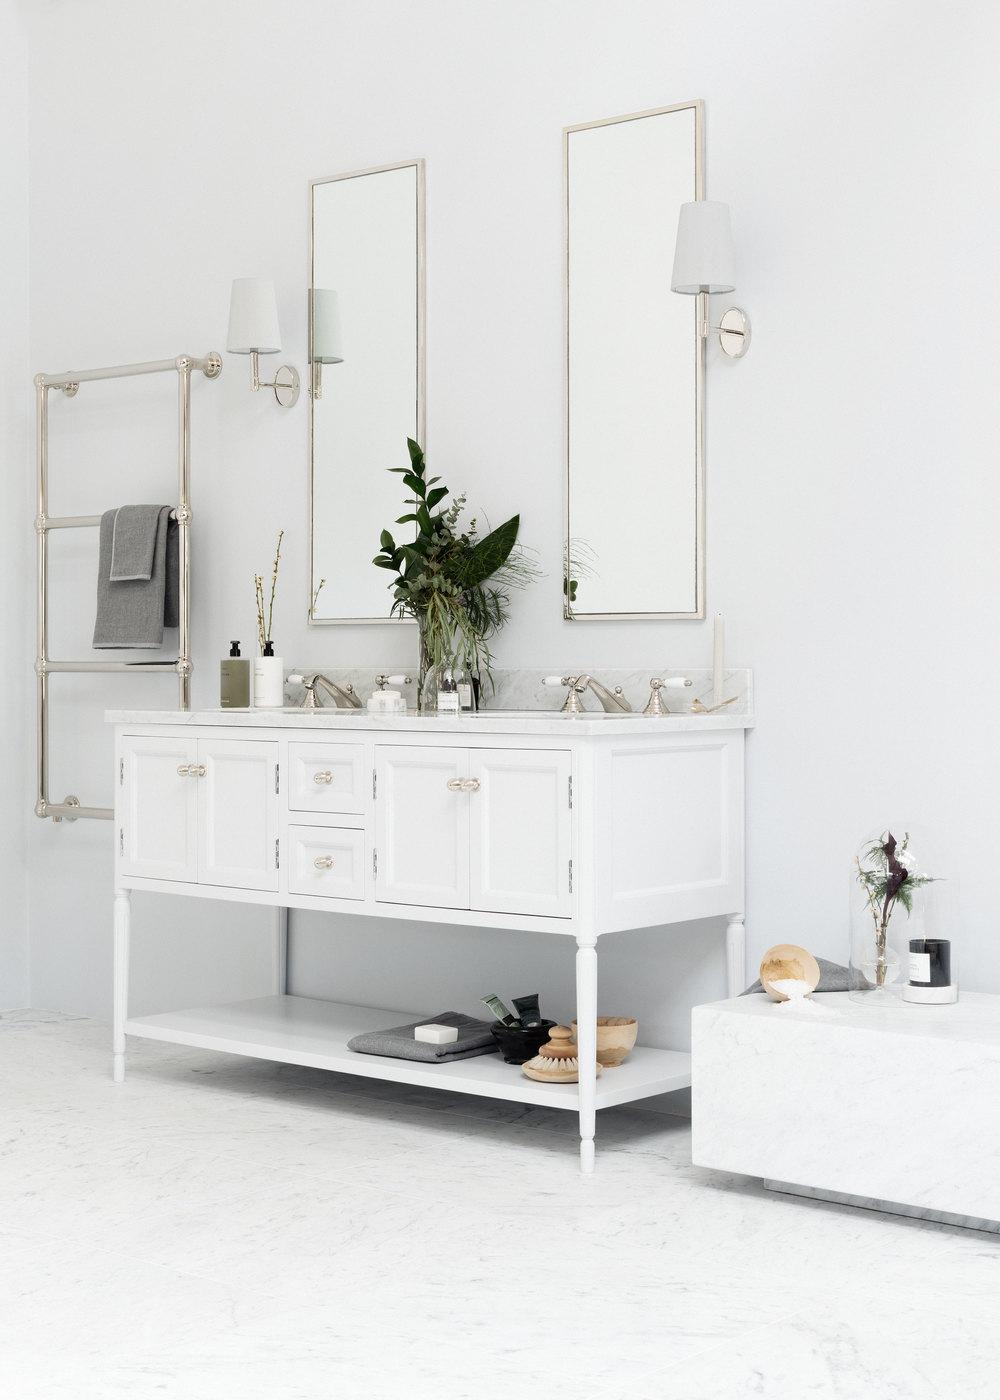 Porter_bathroom_vanities_the_Chester_06.jpg